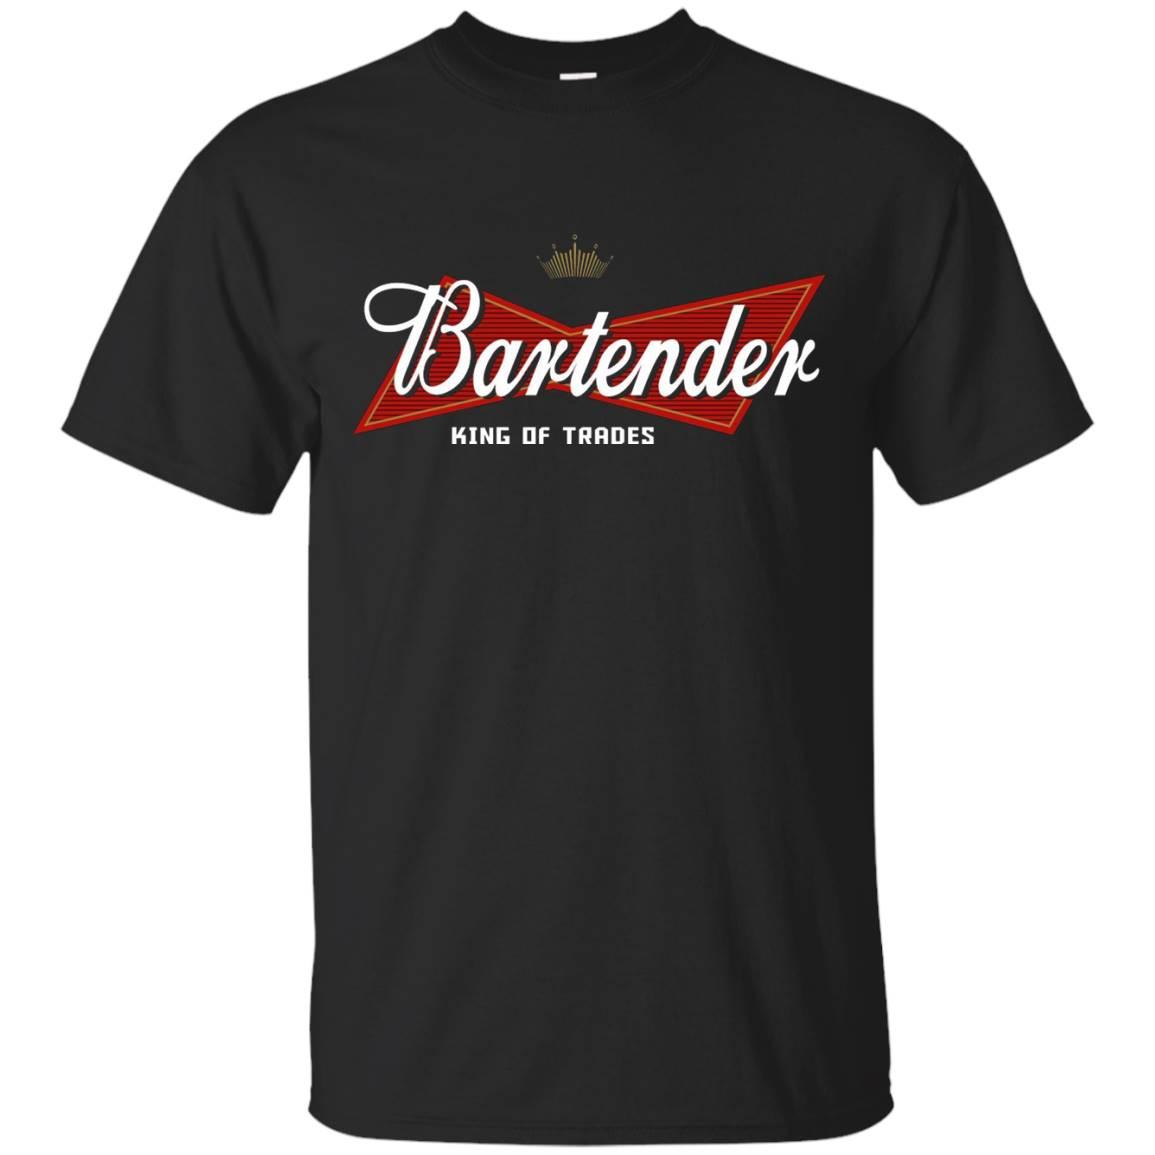 Bartender King of trades T shirt